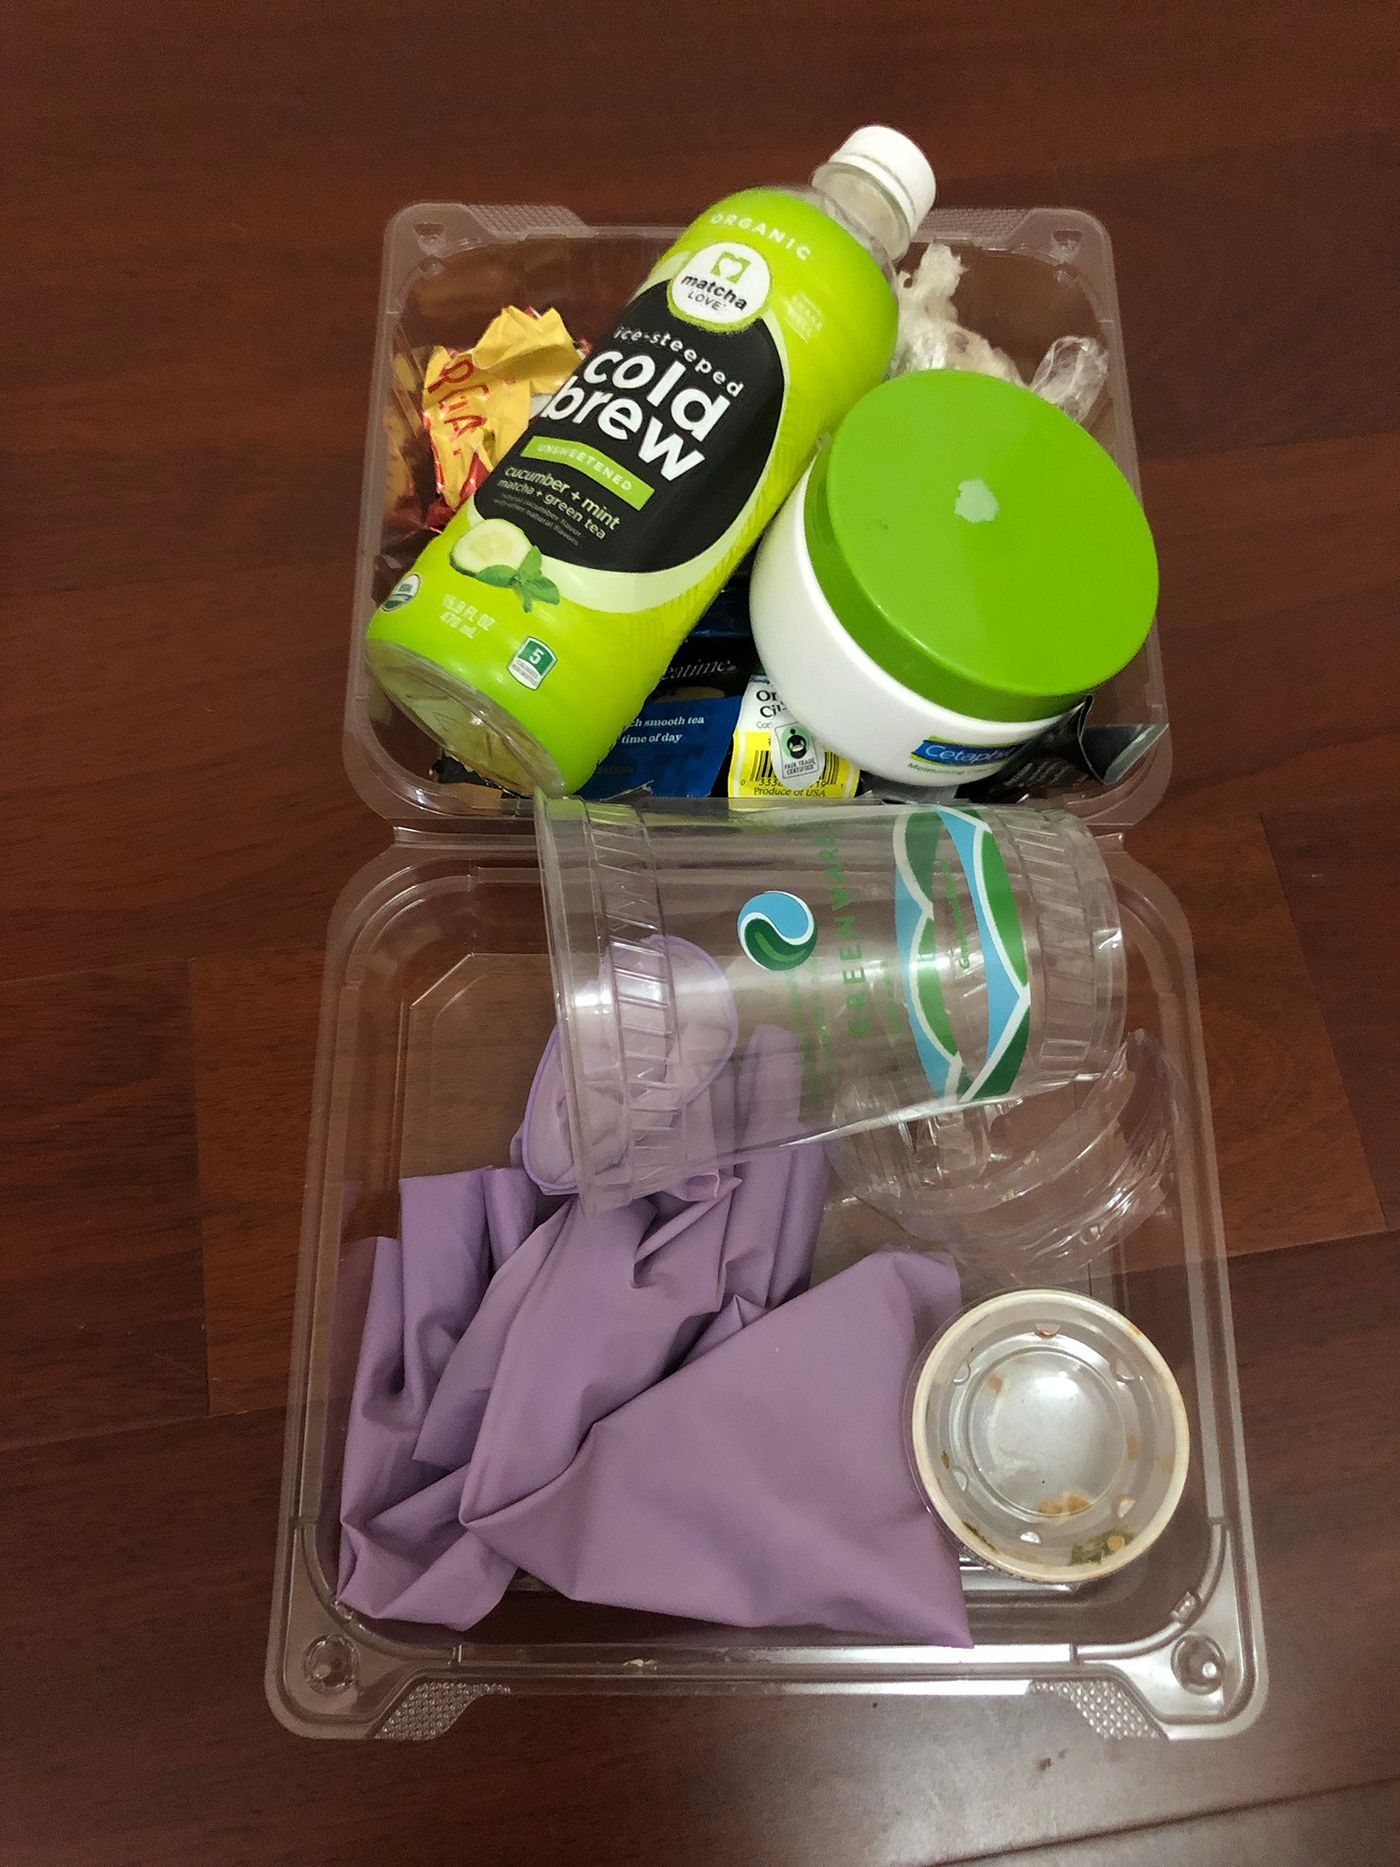 Plastic waste - plastic bottle, plastic cup